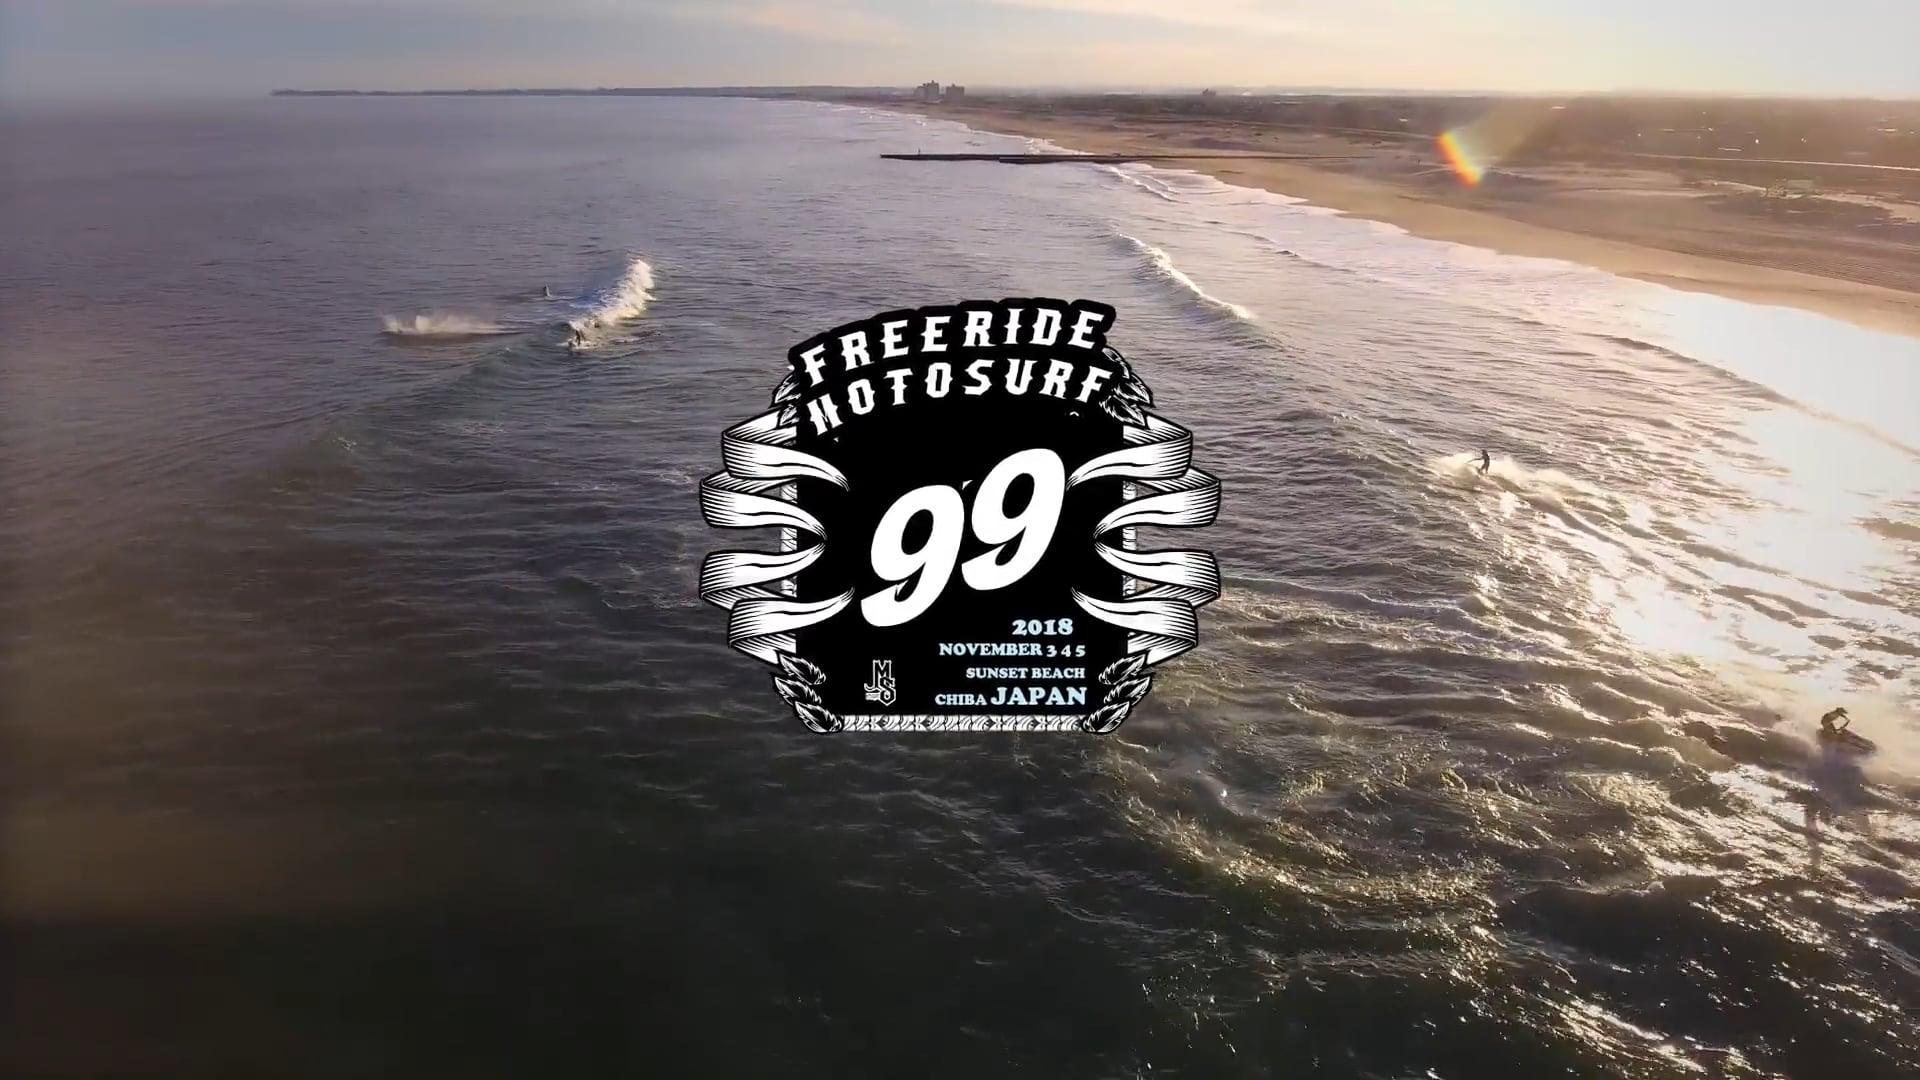 IFWA World Championships Japan 2018 Freeride Motosurf 99